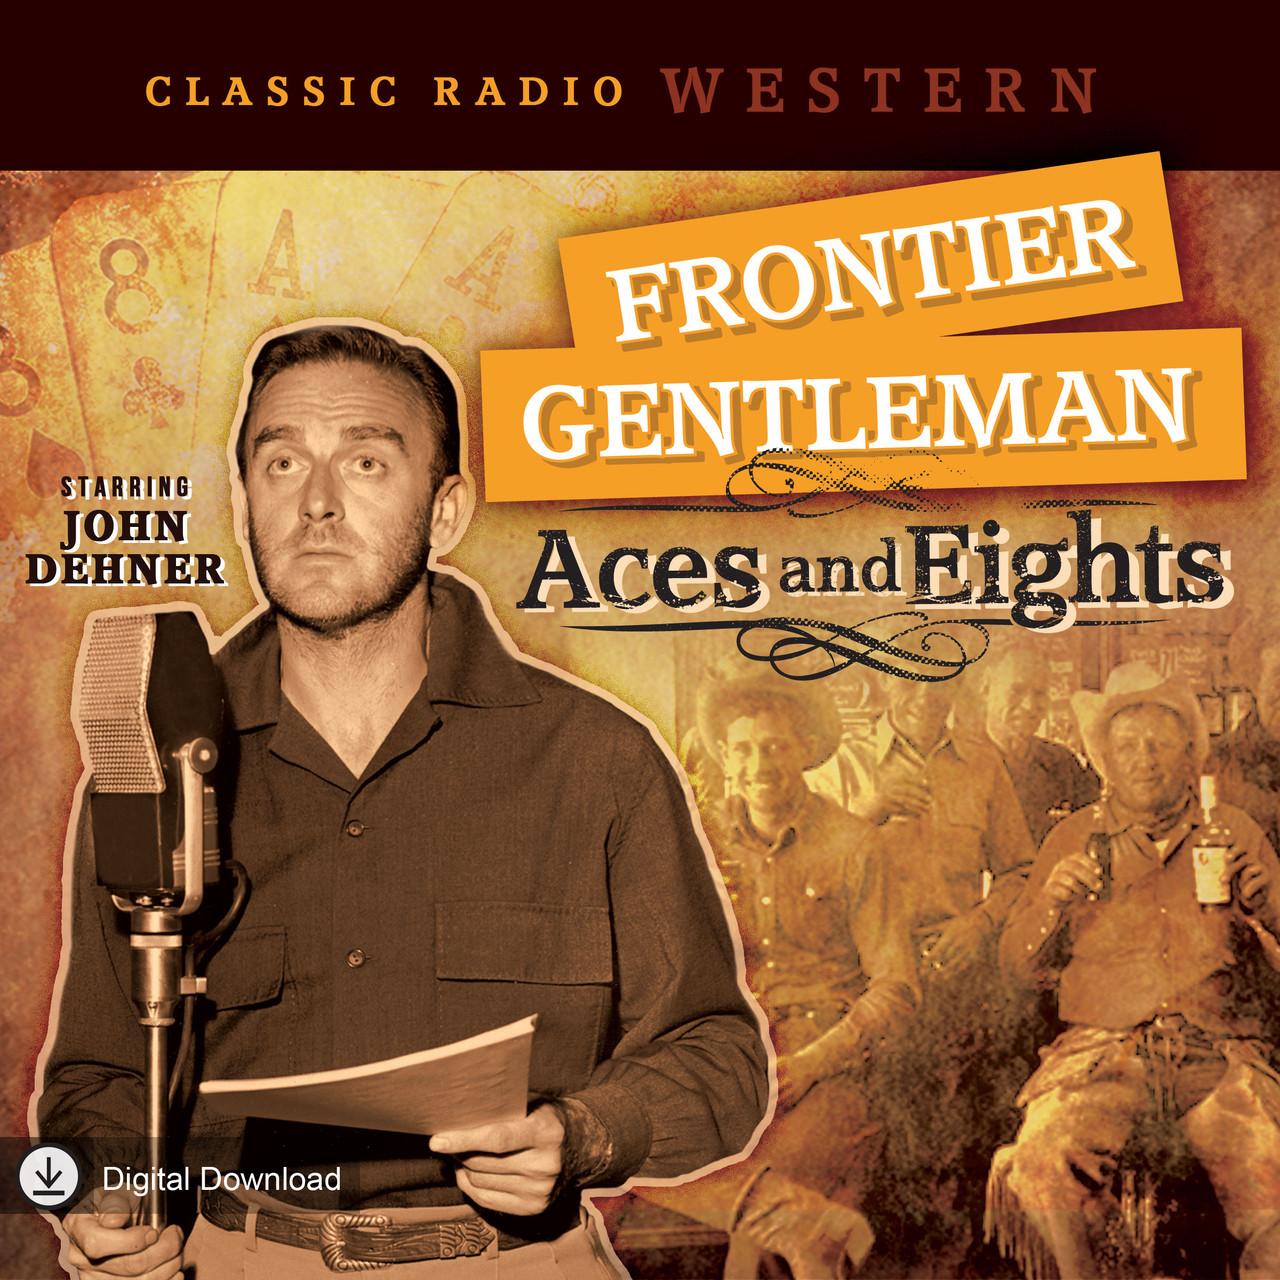 Frontier Gentleman: Aces and Eights (MP3 Download)